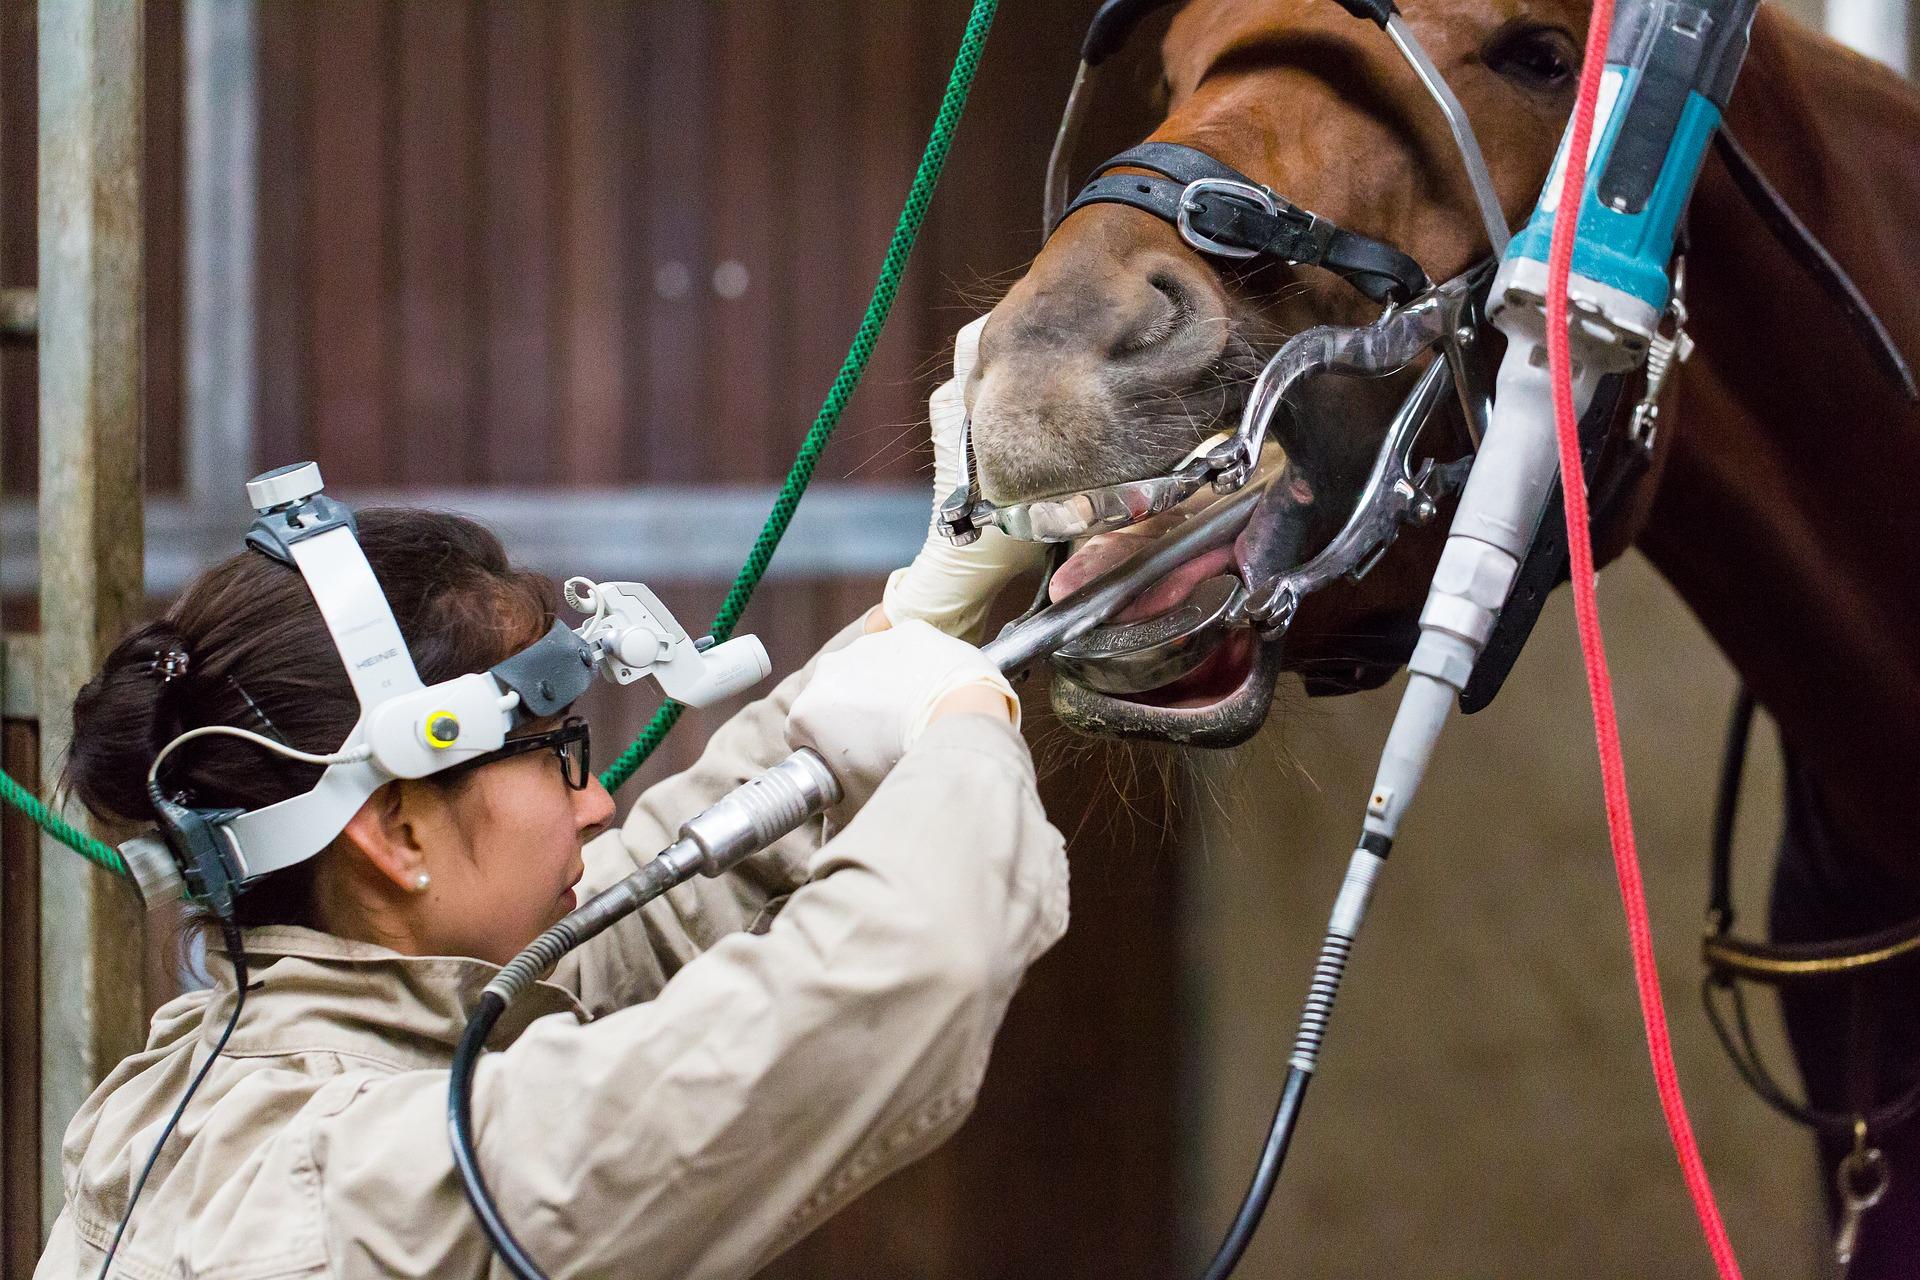 Veterinarian adminsters dental attention in a metal barn